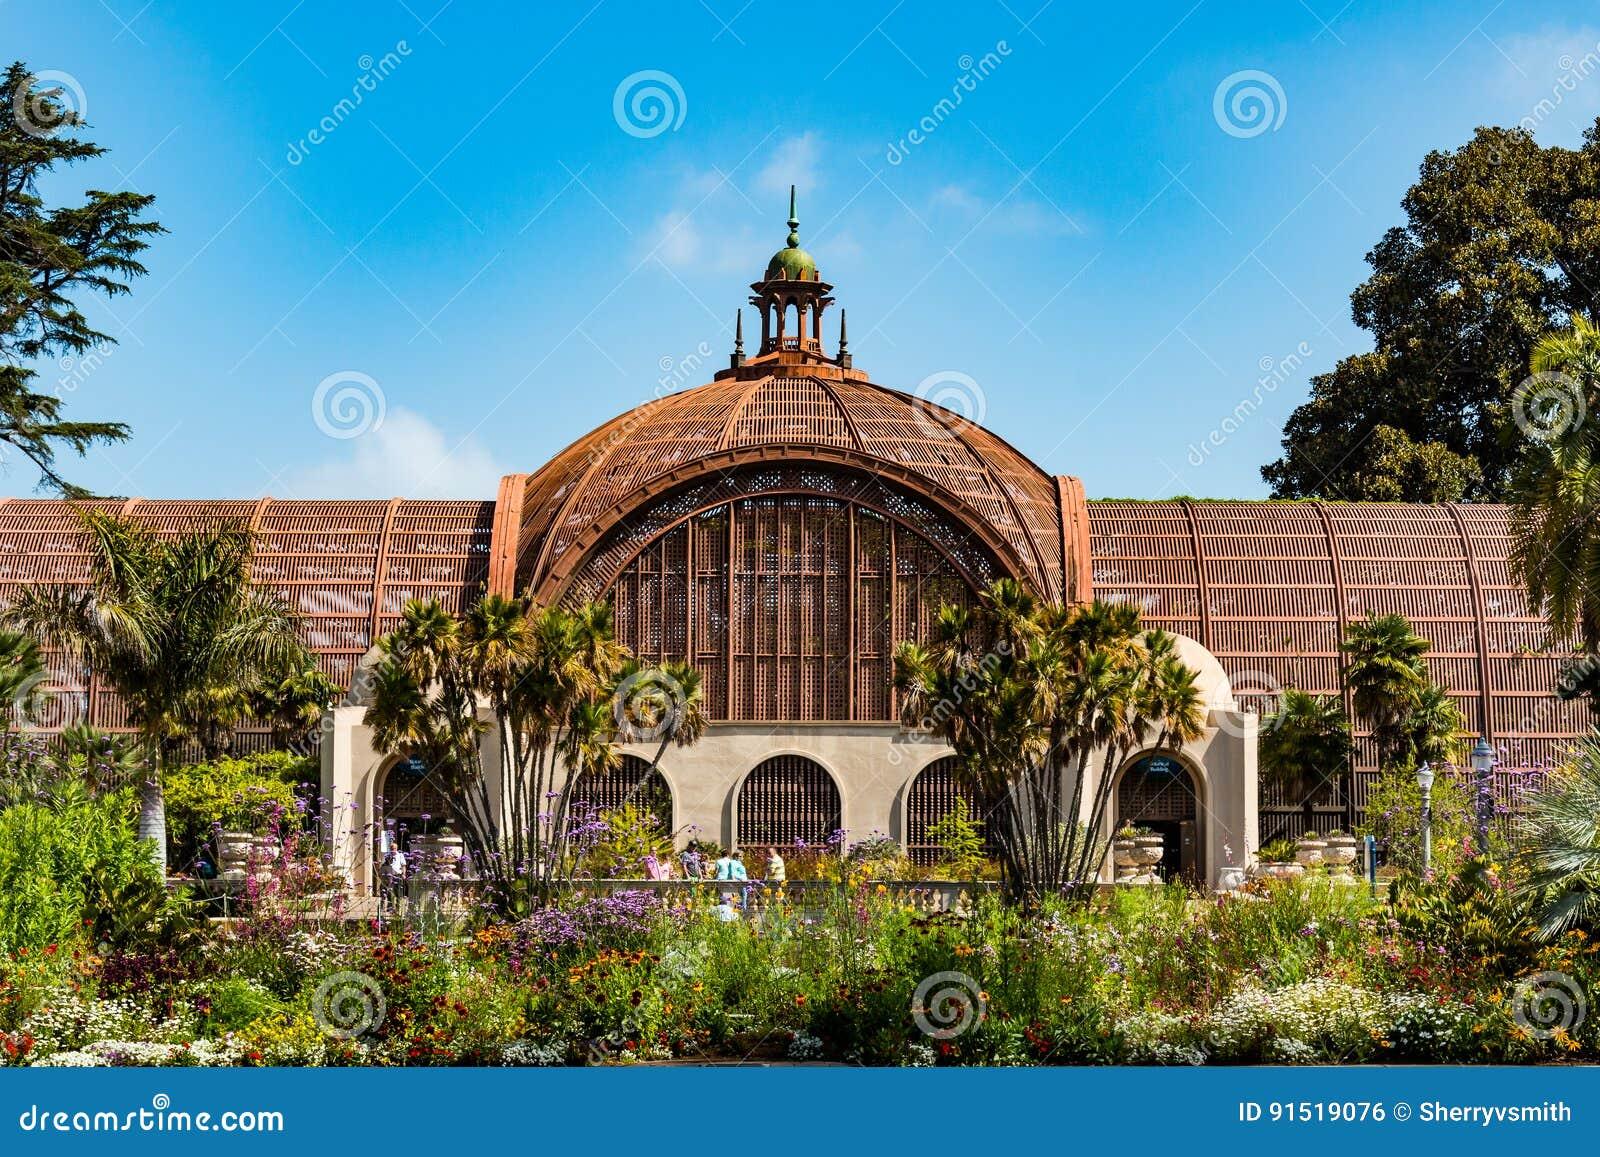 Landmark Botanical Garden In Balboa Park Editorial Photo - Image of ...